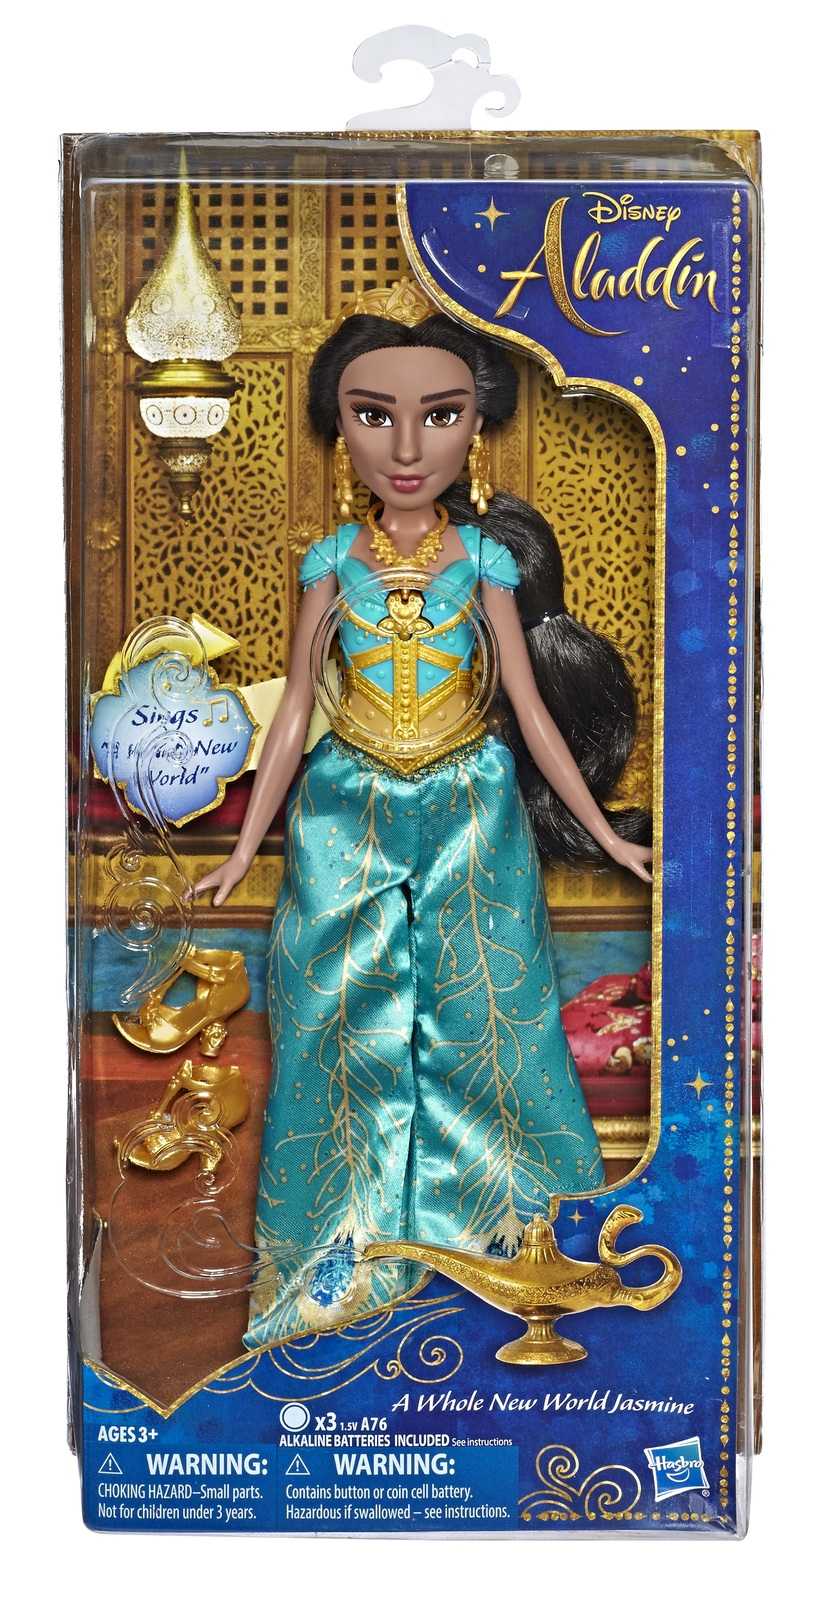 Disney's Aladdin: Jasmine - Singing Fashion Doll image